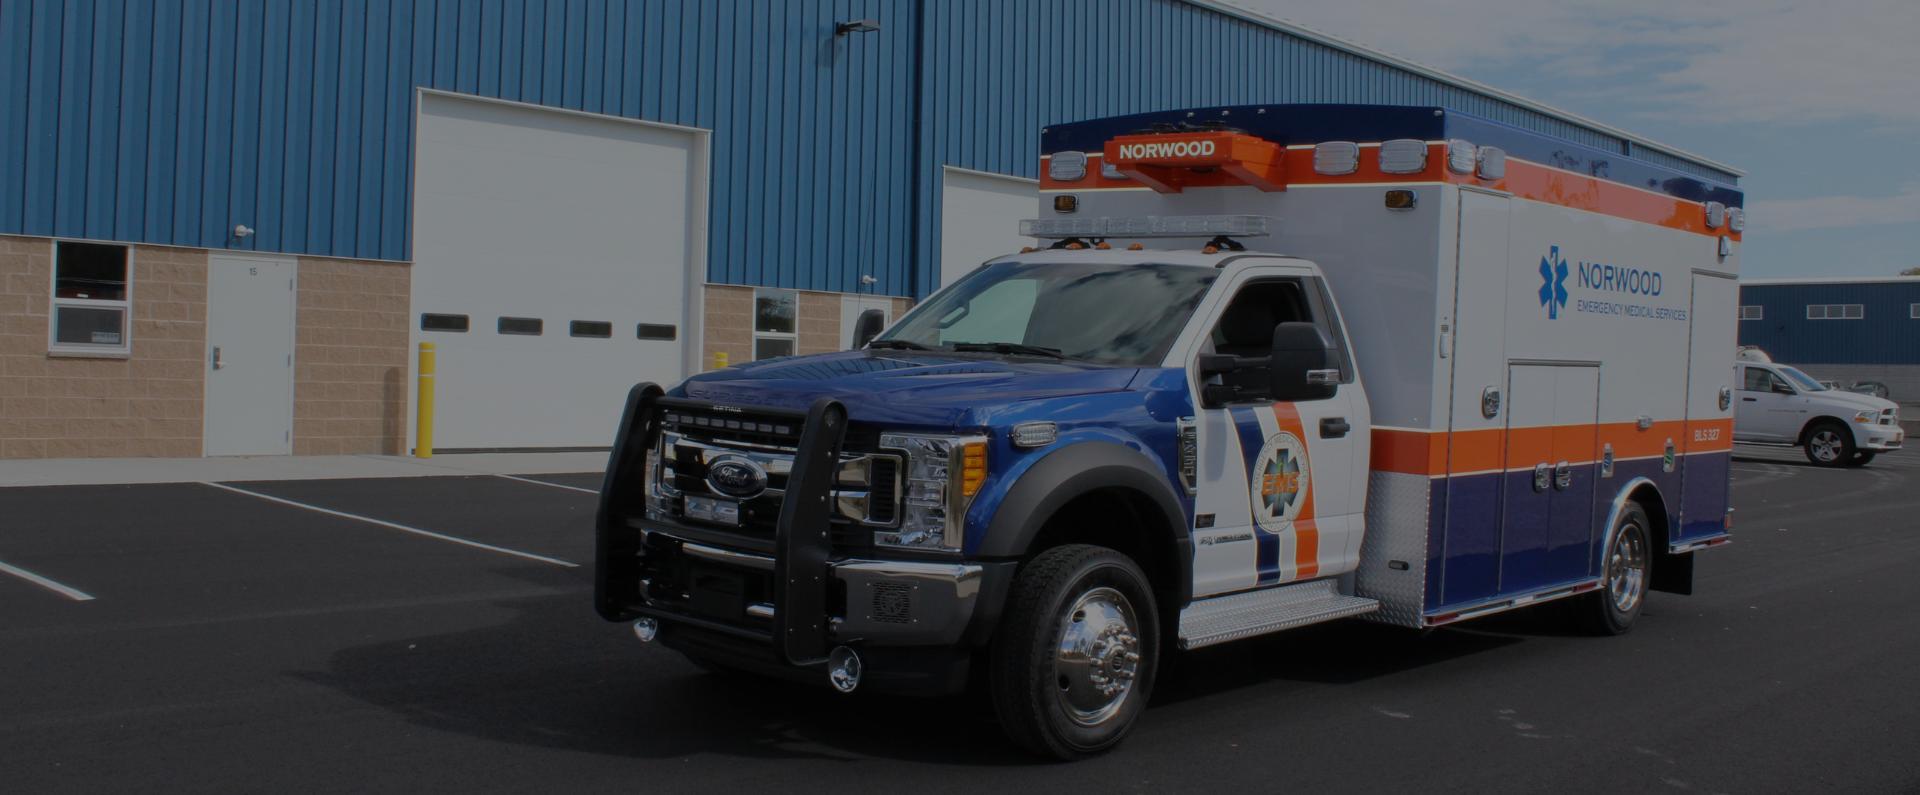 Braun Ambulances First Priority Emergency Vehicles